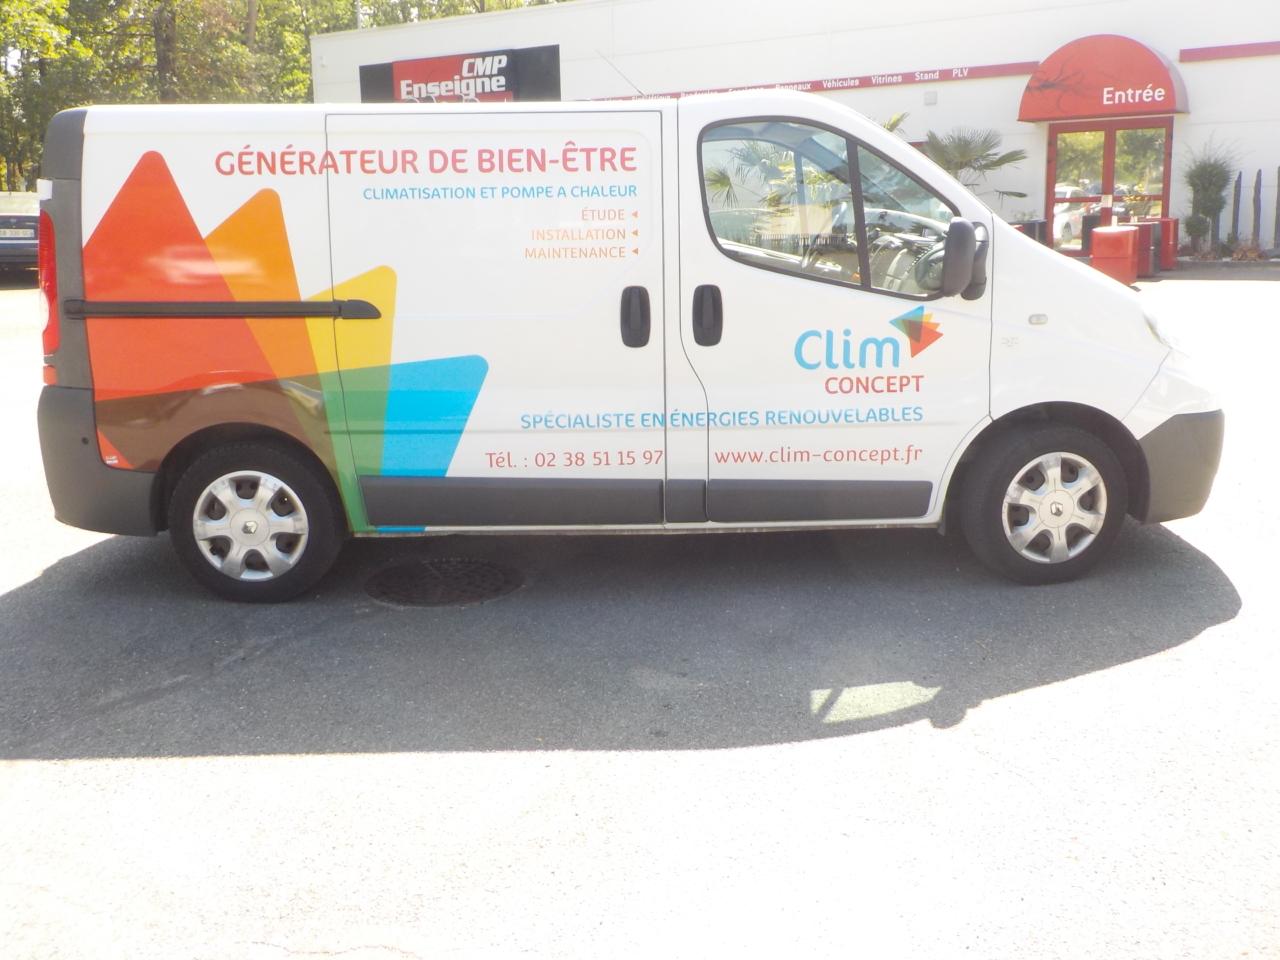 Clim Concept